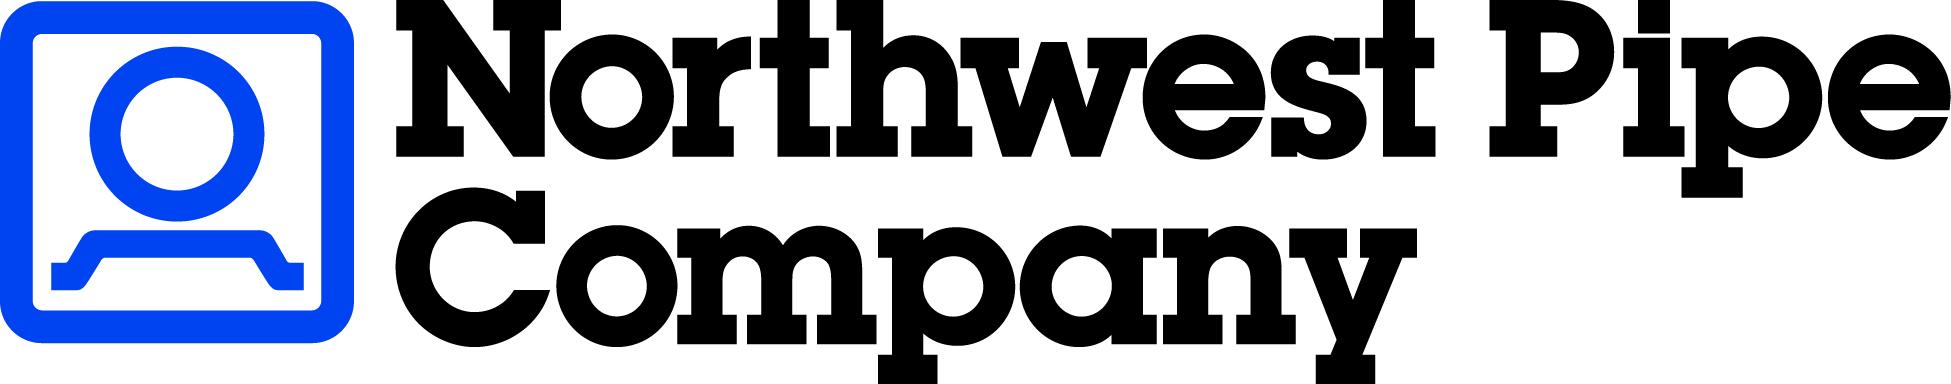 Northwest Pipe Company logo